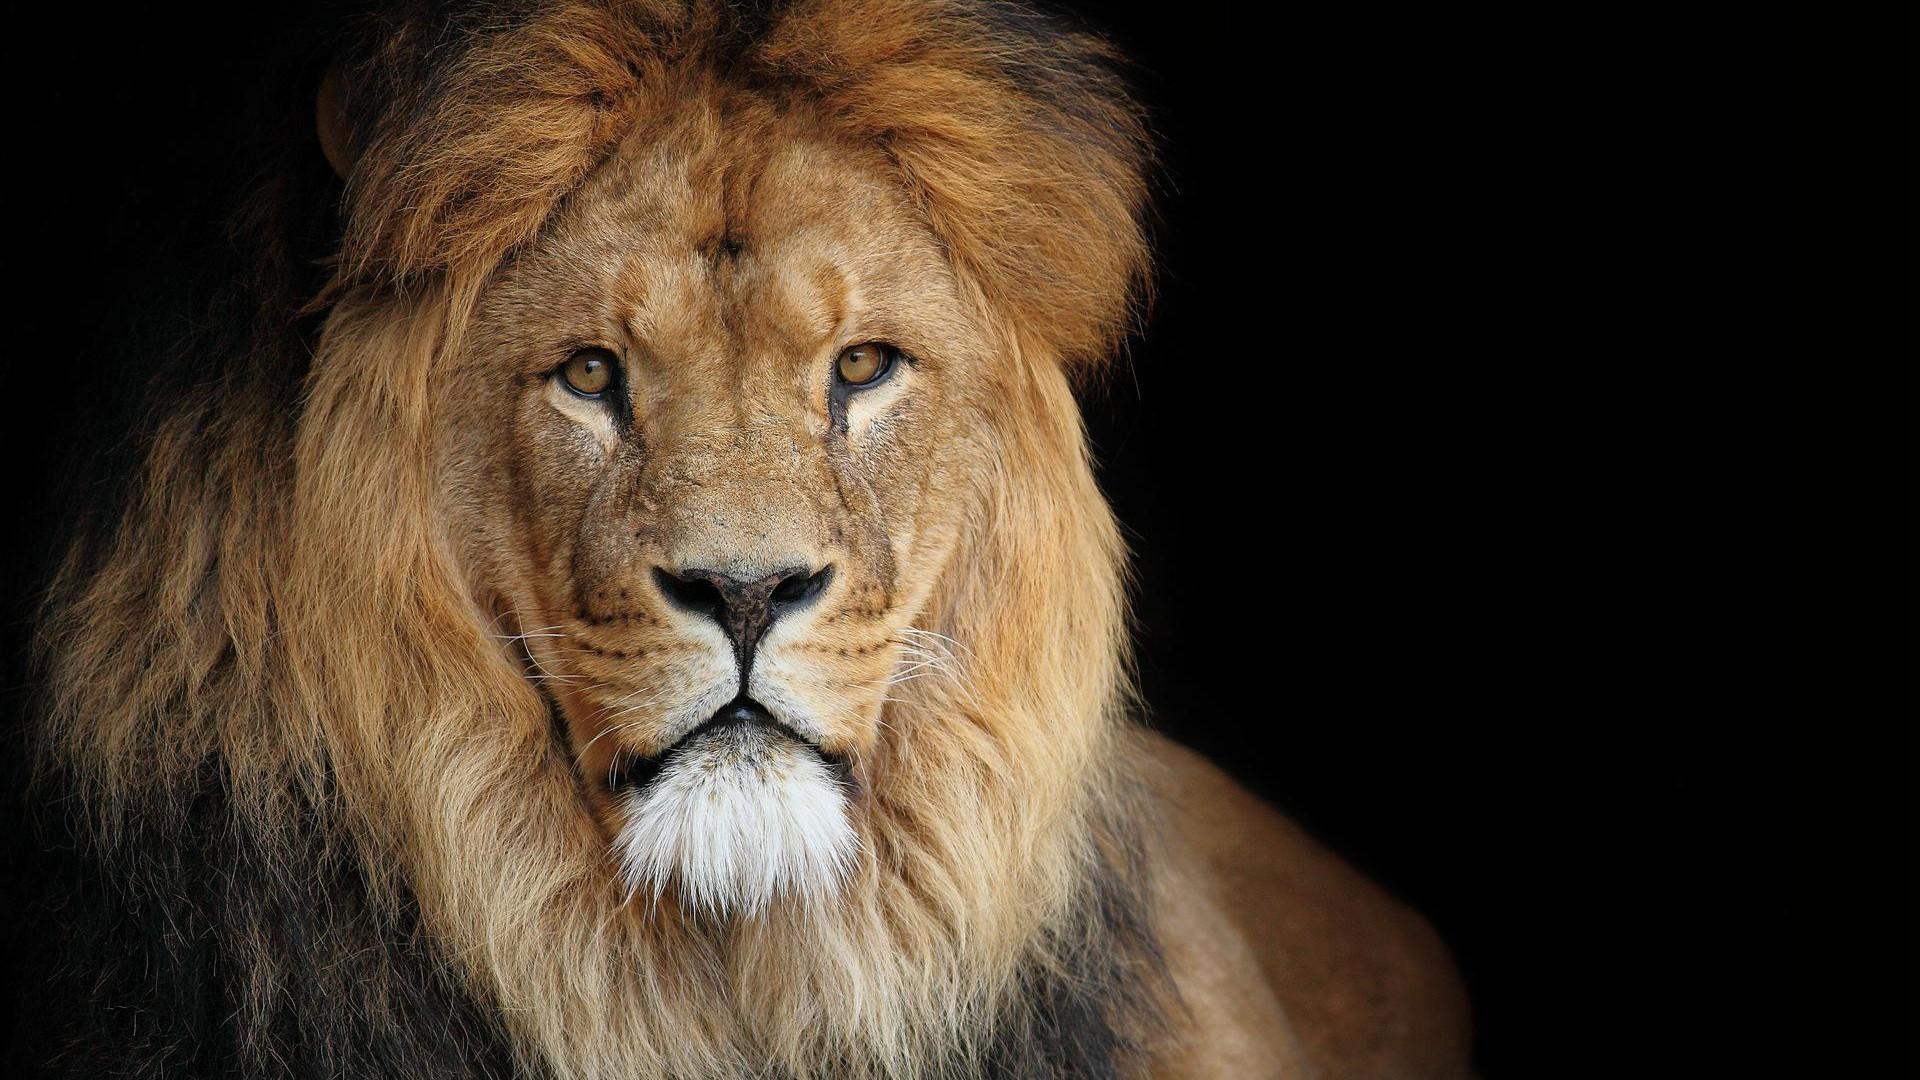 African Lion Roaring Wallpaper